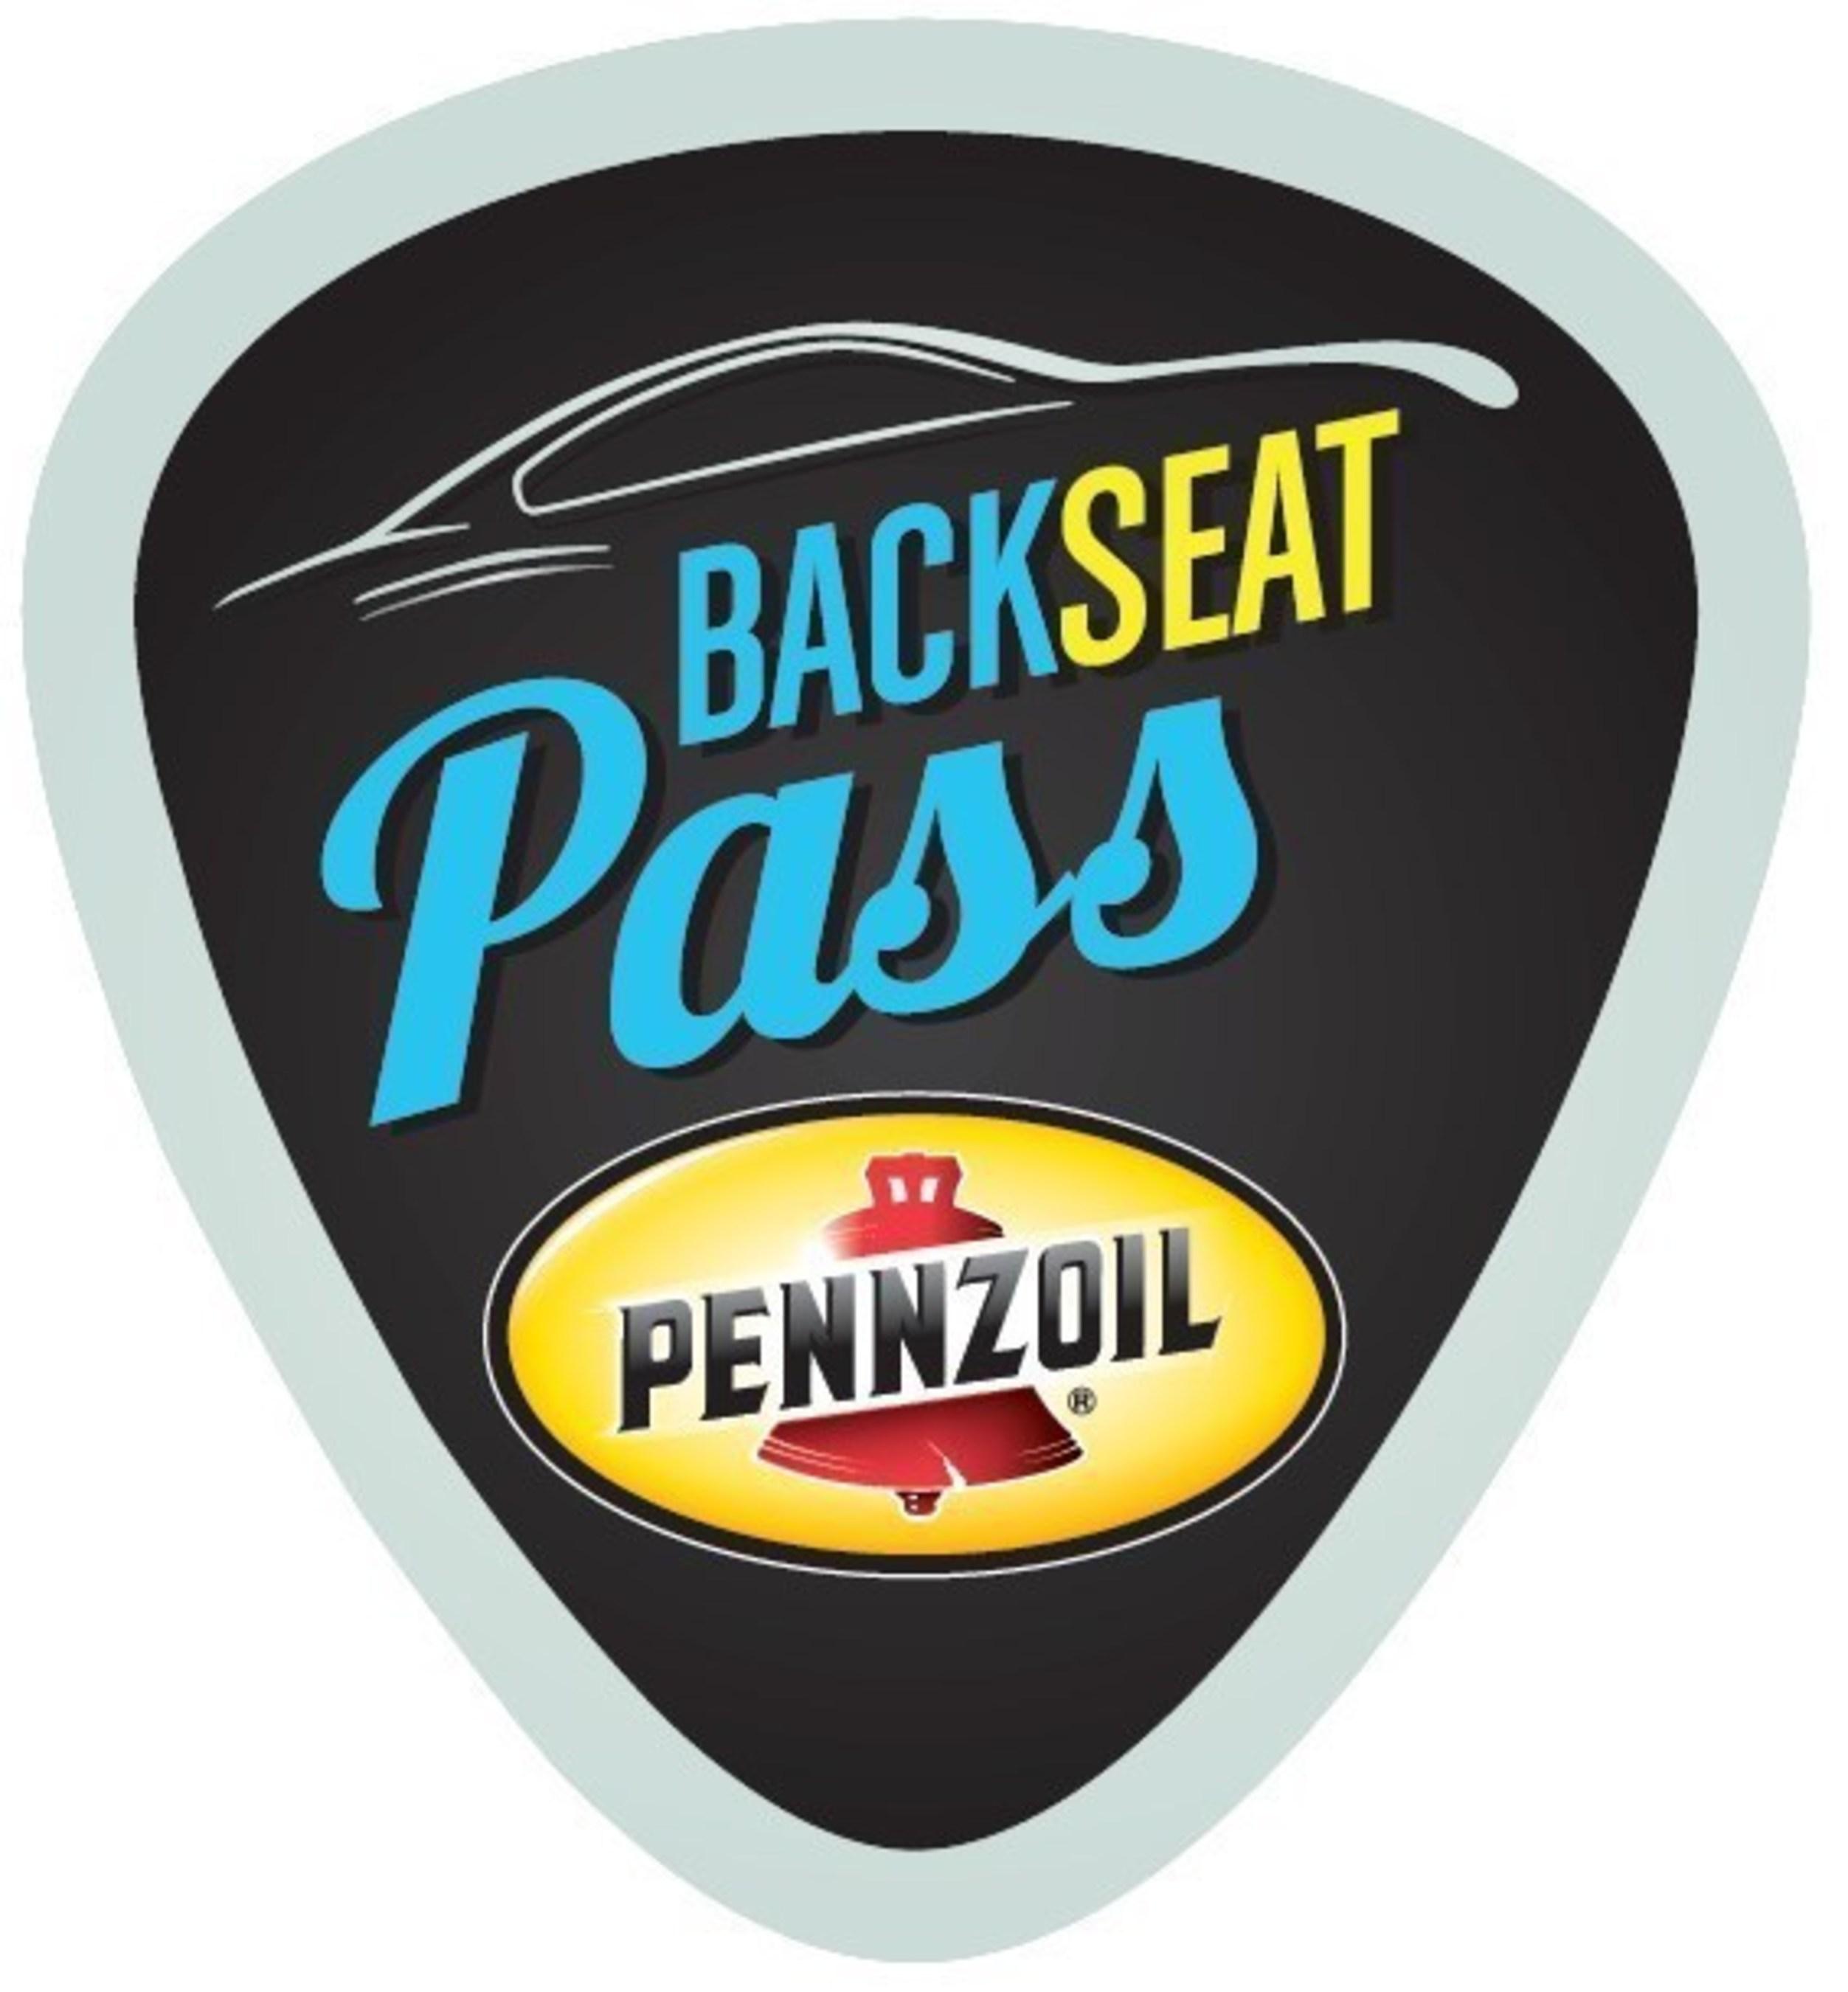 Pennzoil Backseat Pass Logo